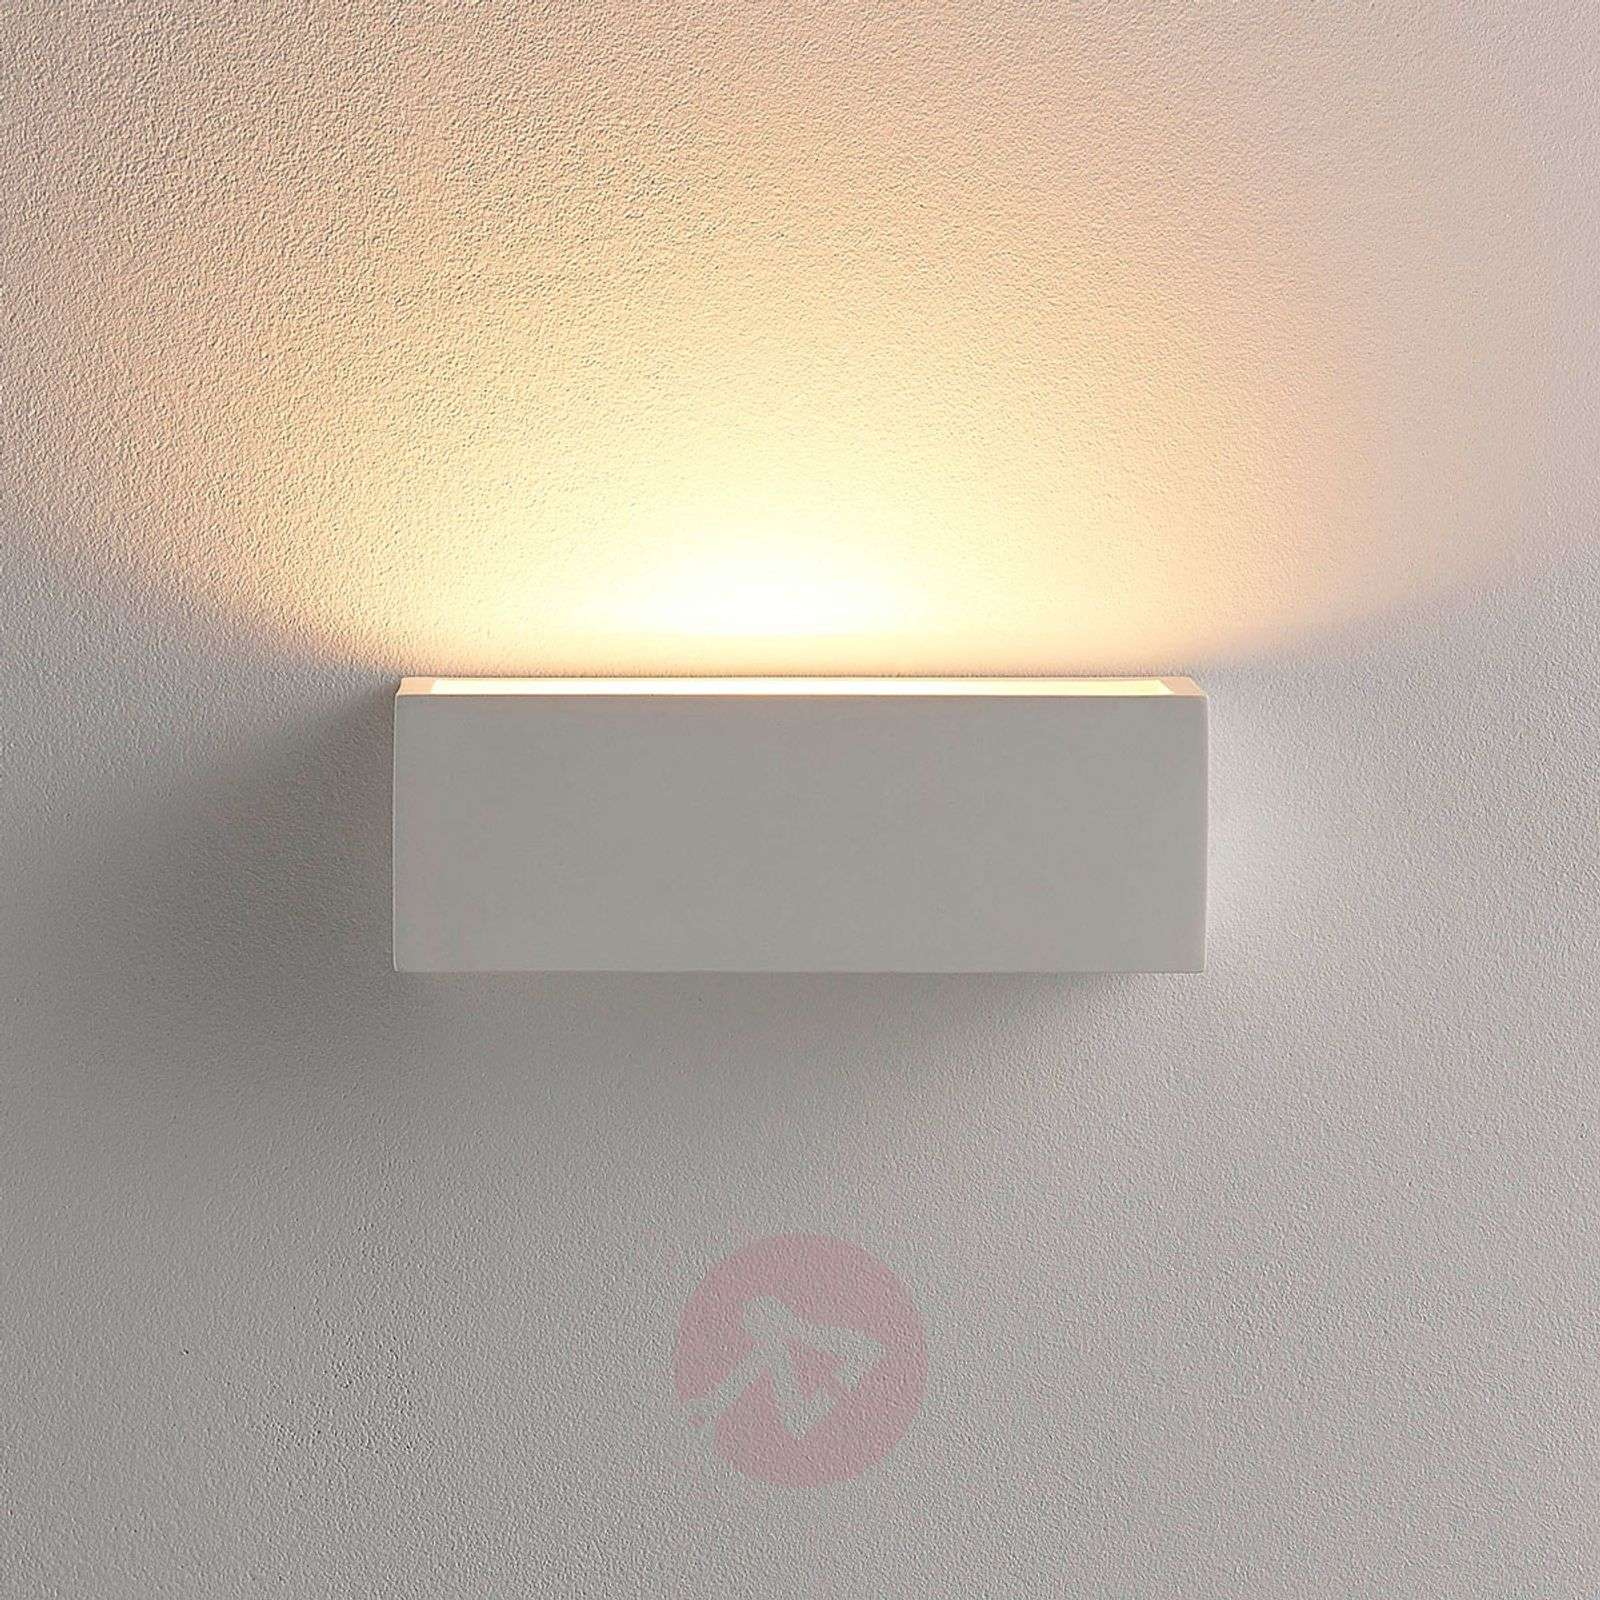 Simple LED plaster wall lamp Santino-9621333-02